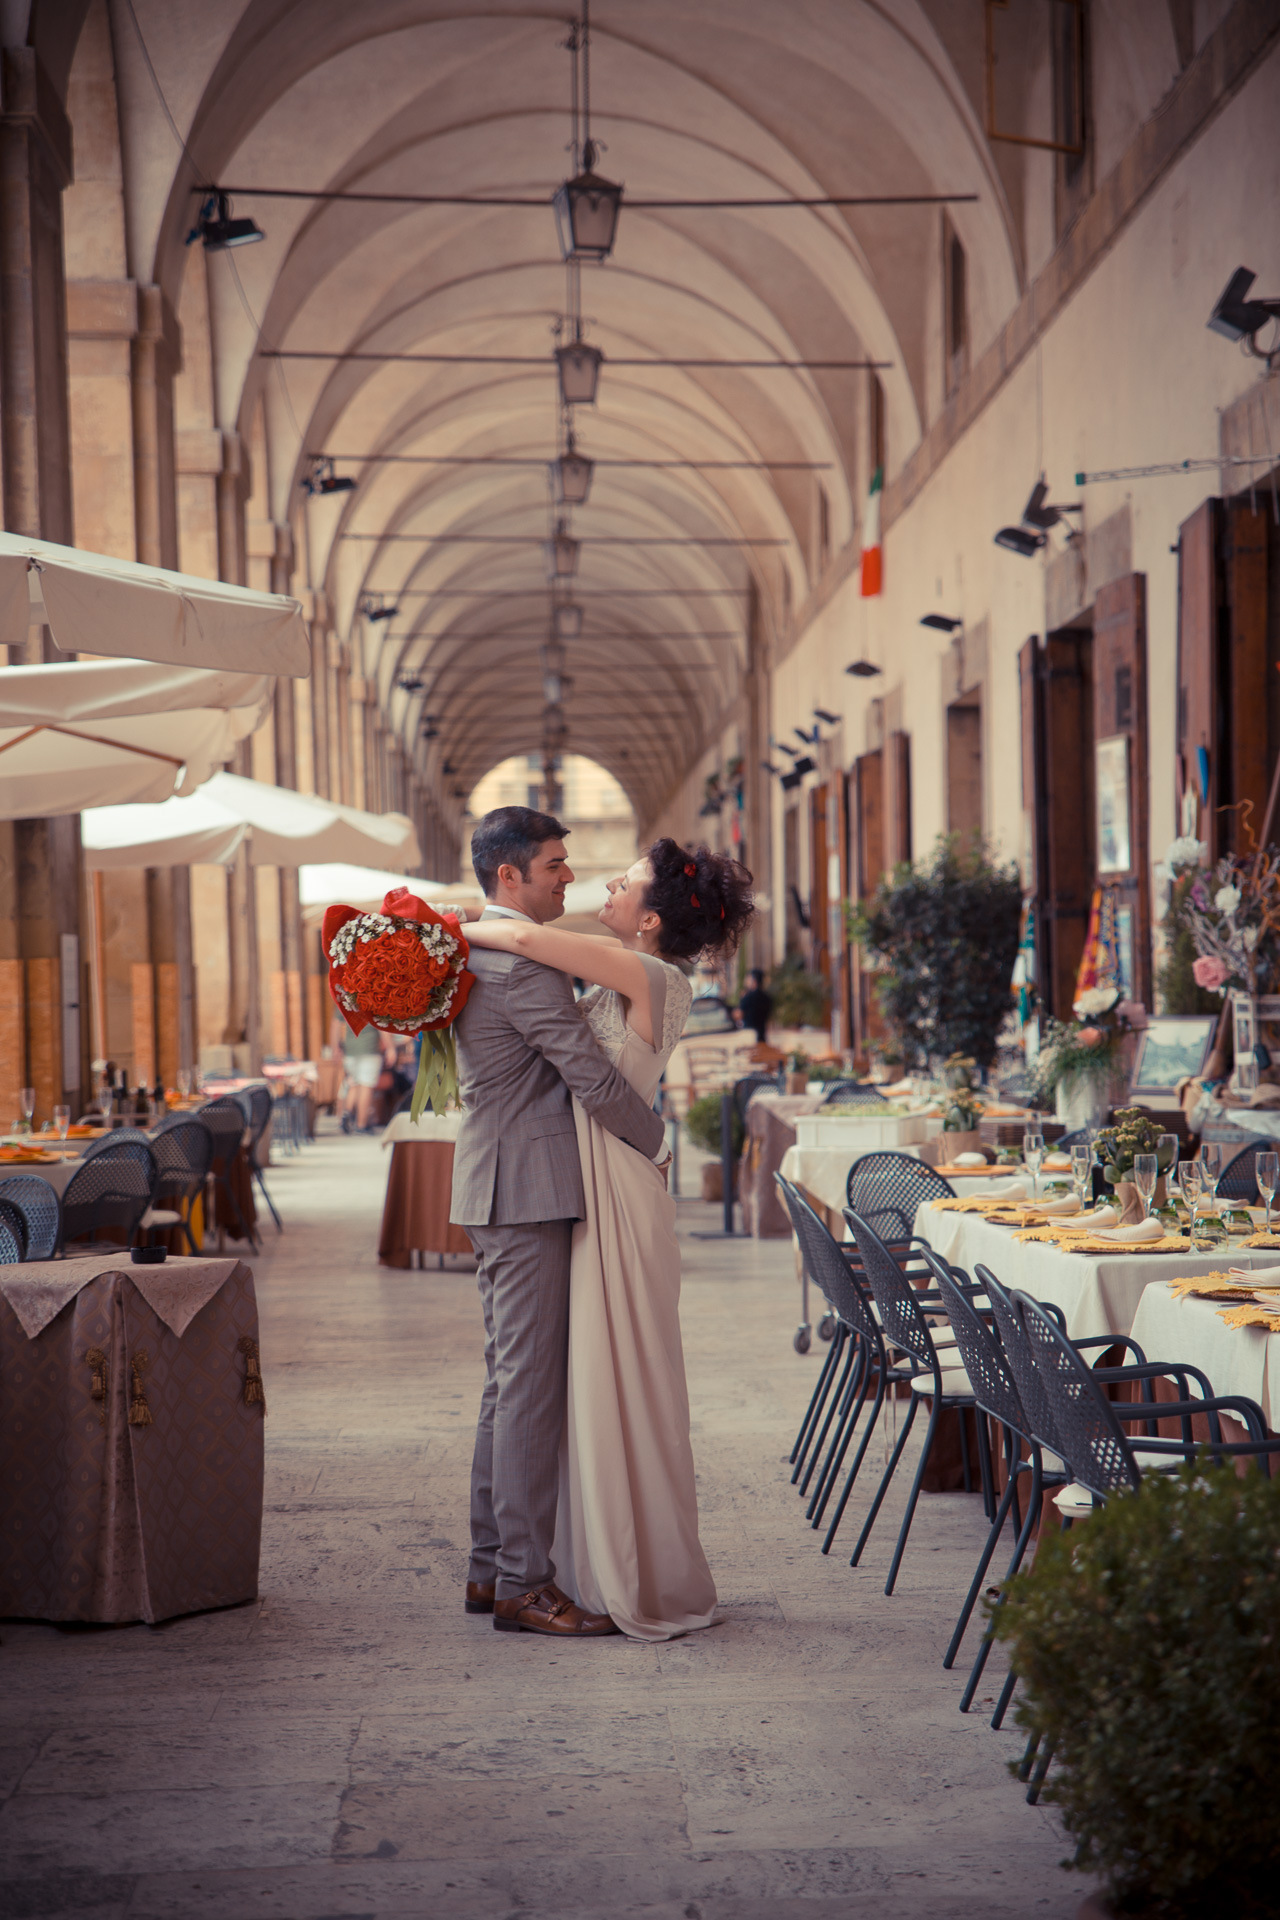 140614181558 - Foto Francesco Ghignoni